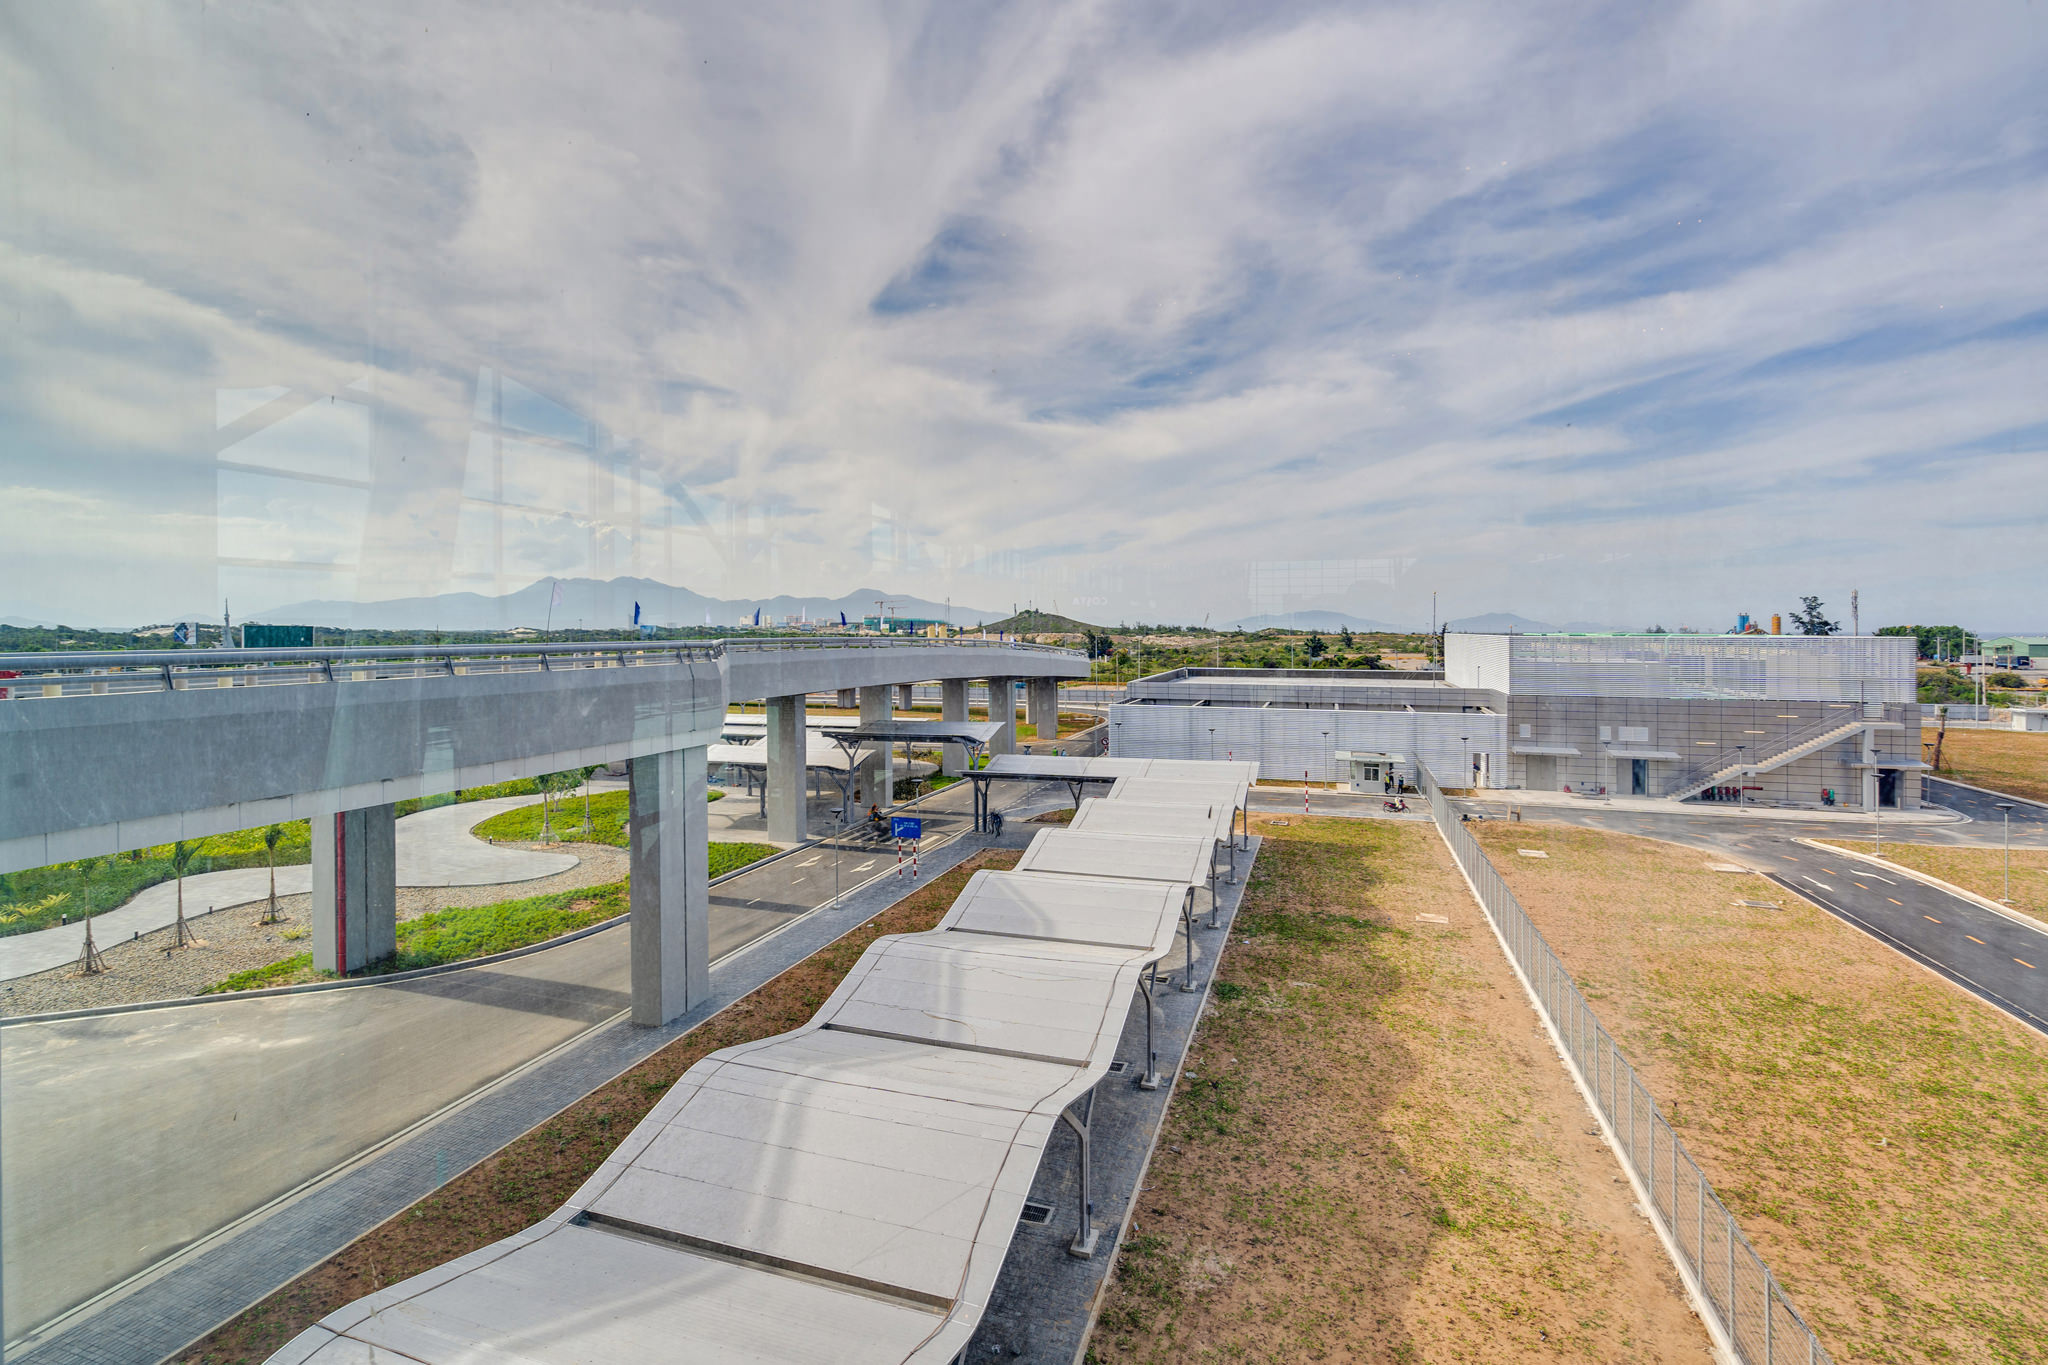 20180626 - Cam Ranh Airport - Architecture - 0311.jpg